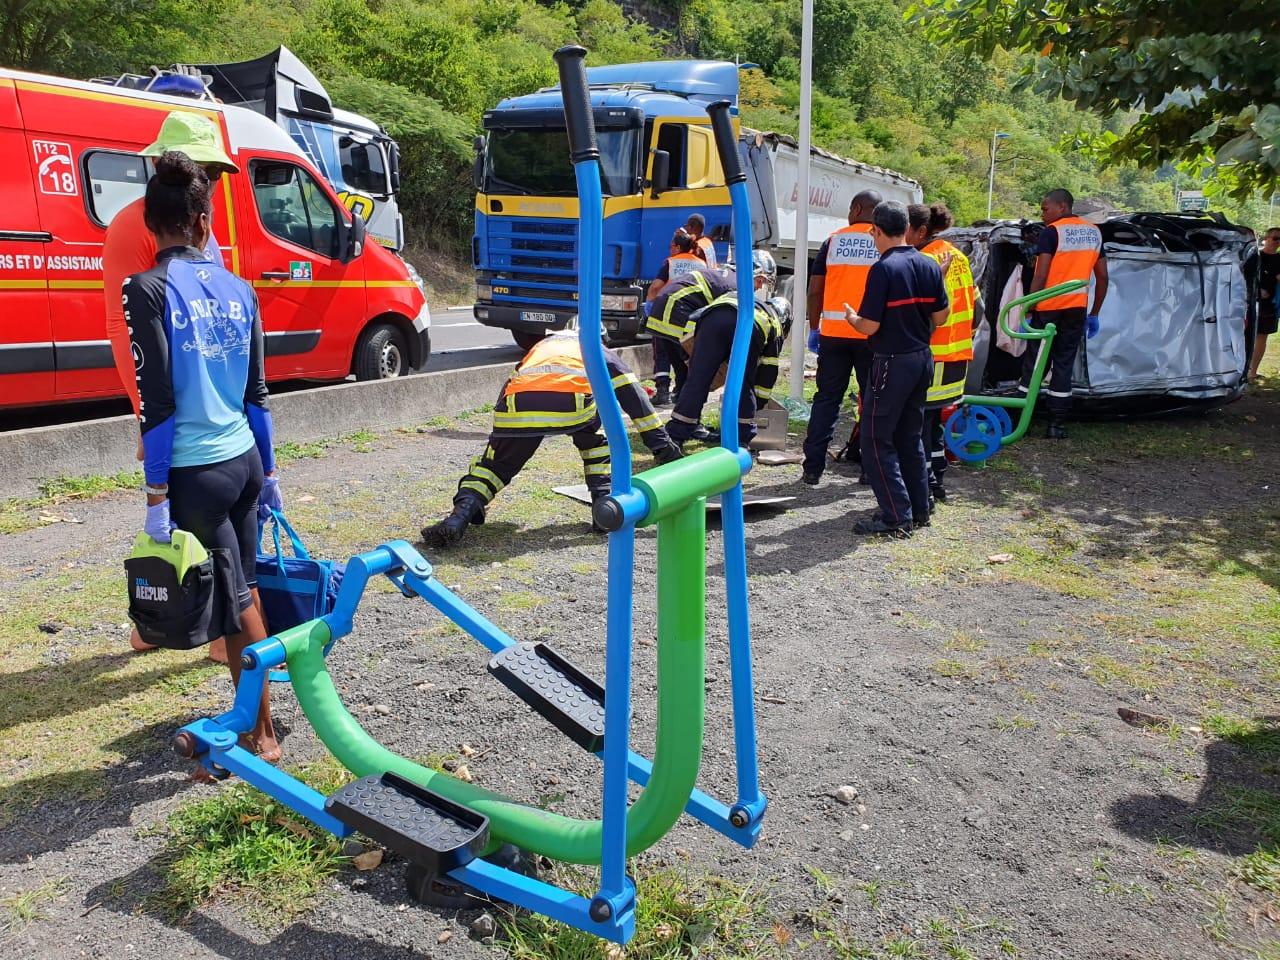 Impressionnant accident à Gourbeyre